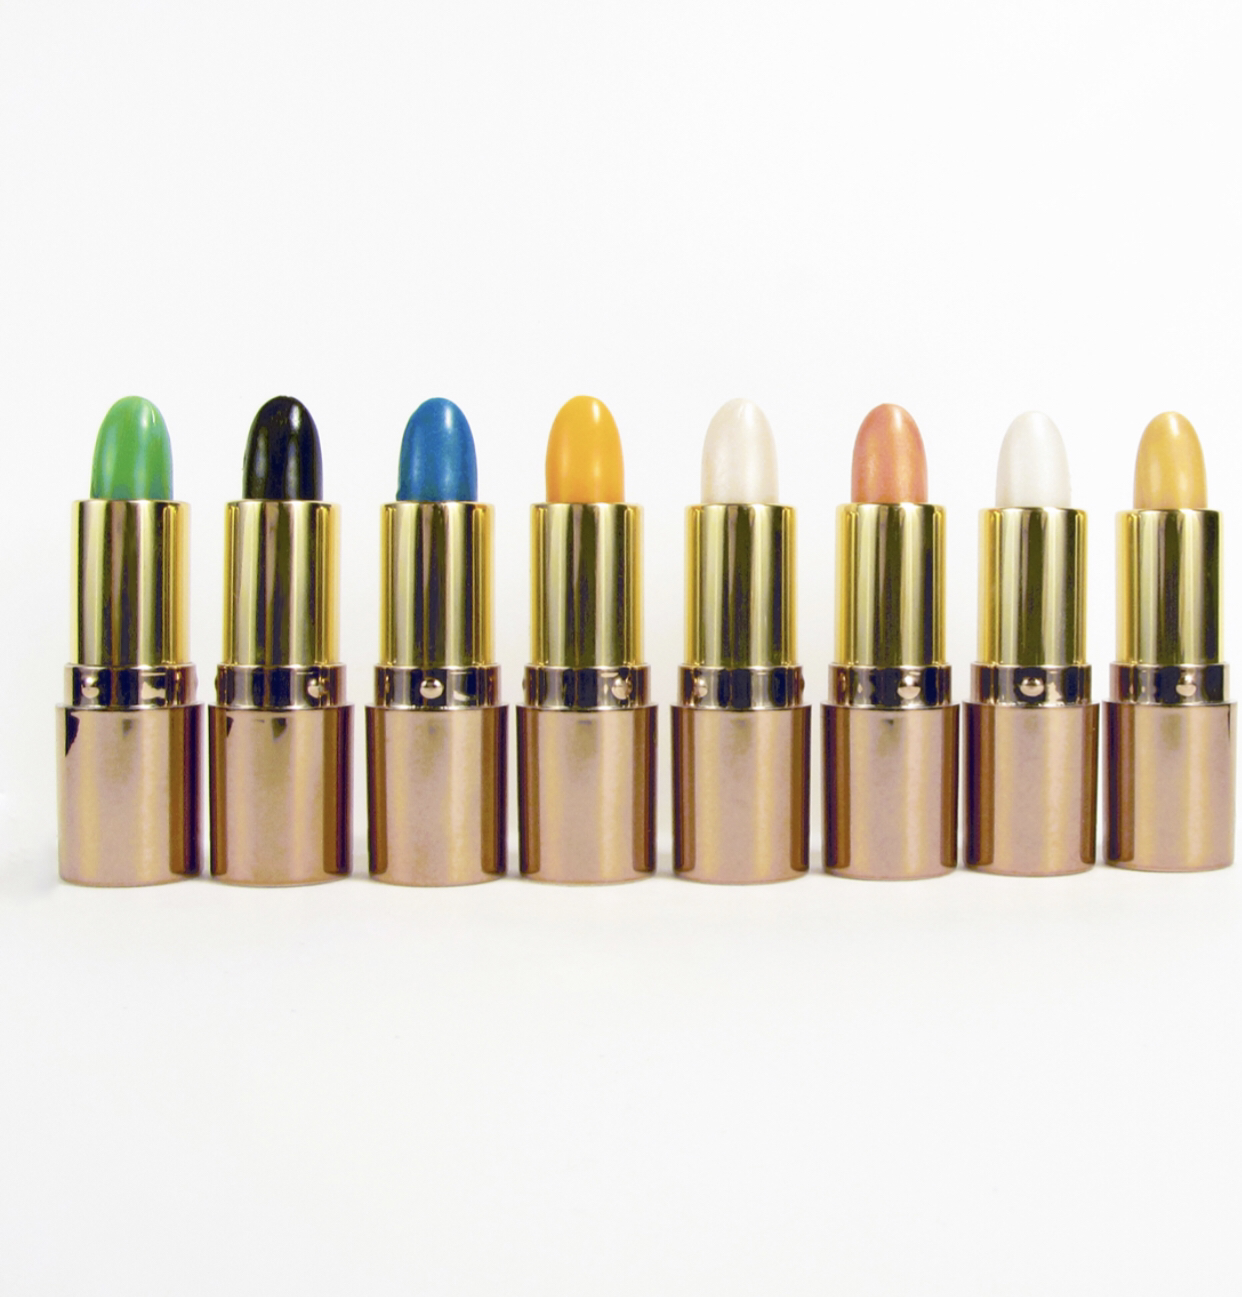 Shy Petite Lipstick Set